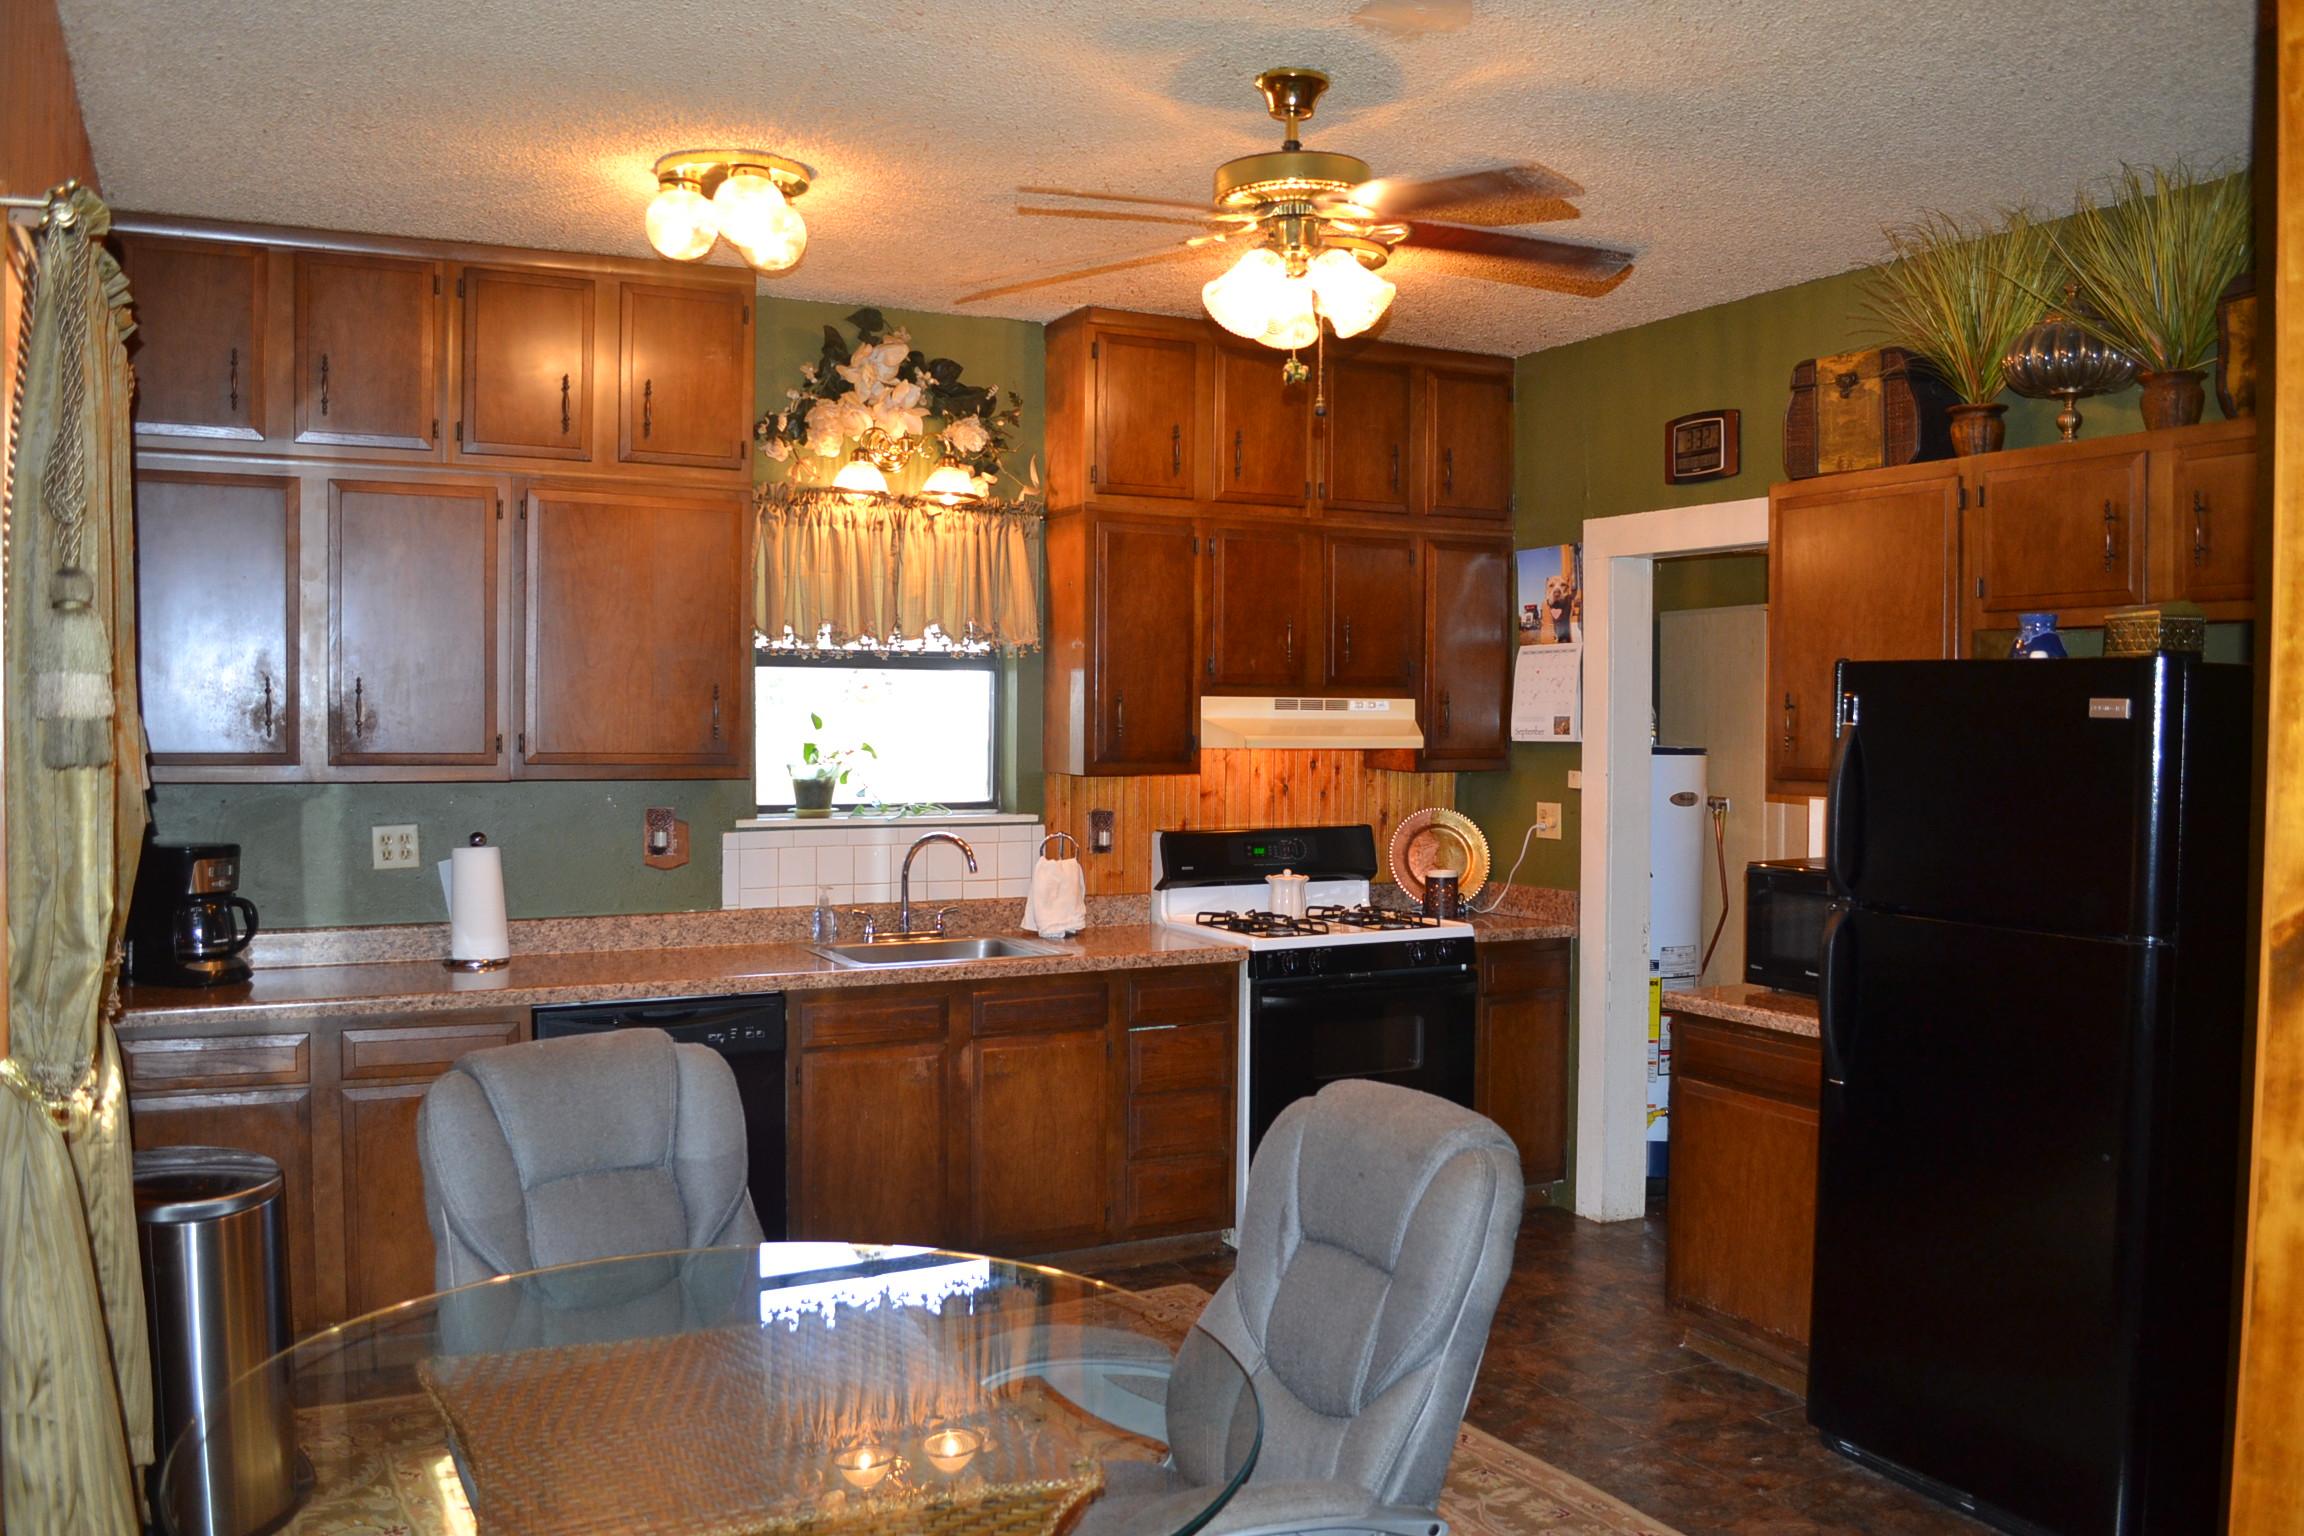 Wichita Falls Homes For Sale Property Search In Wichita Falls